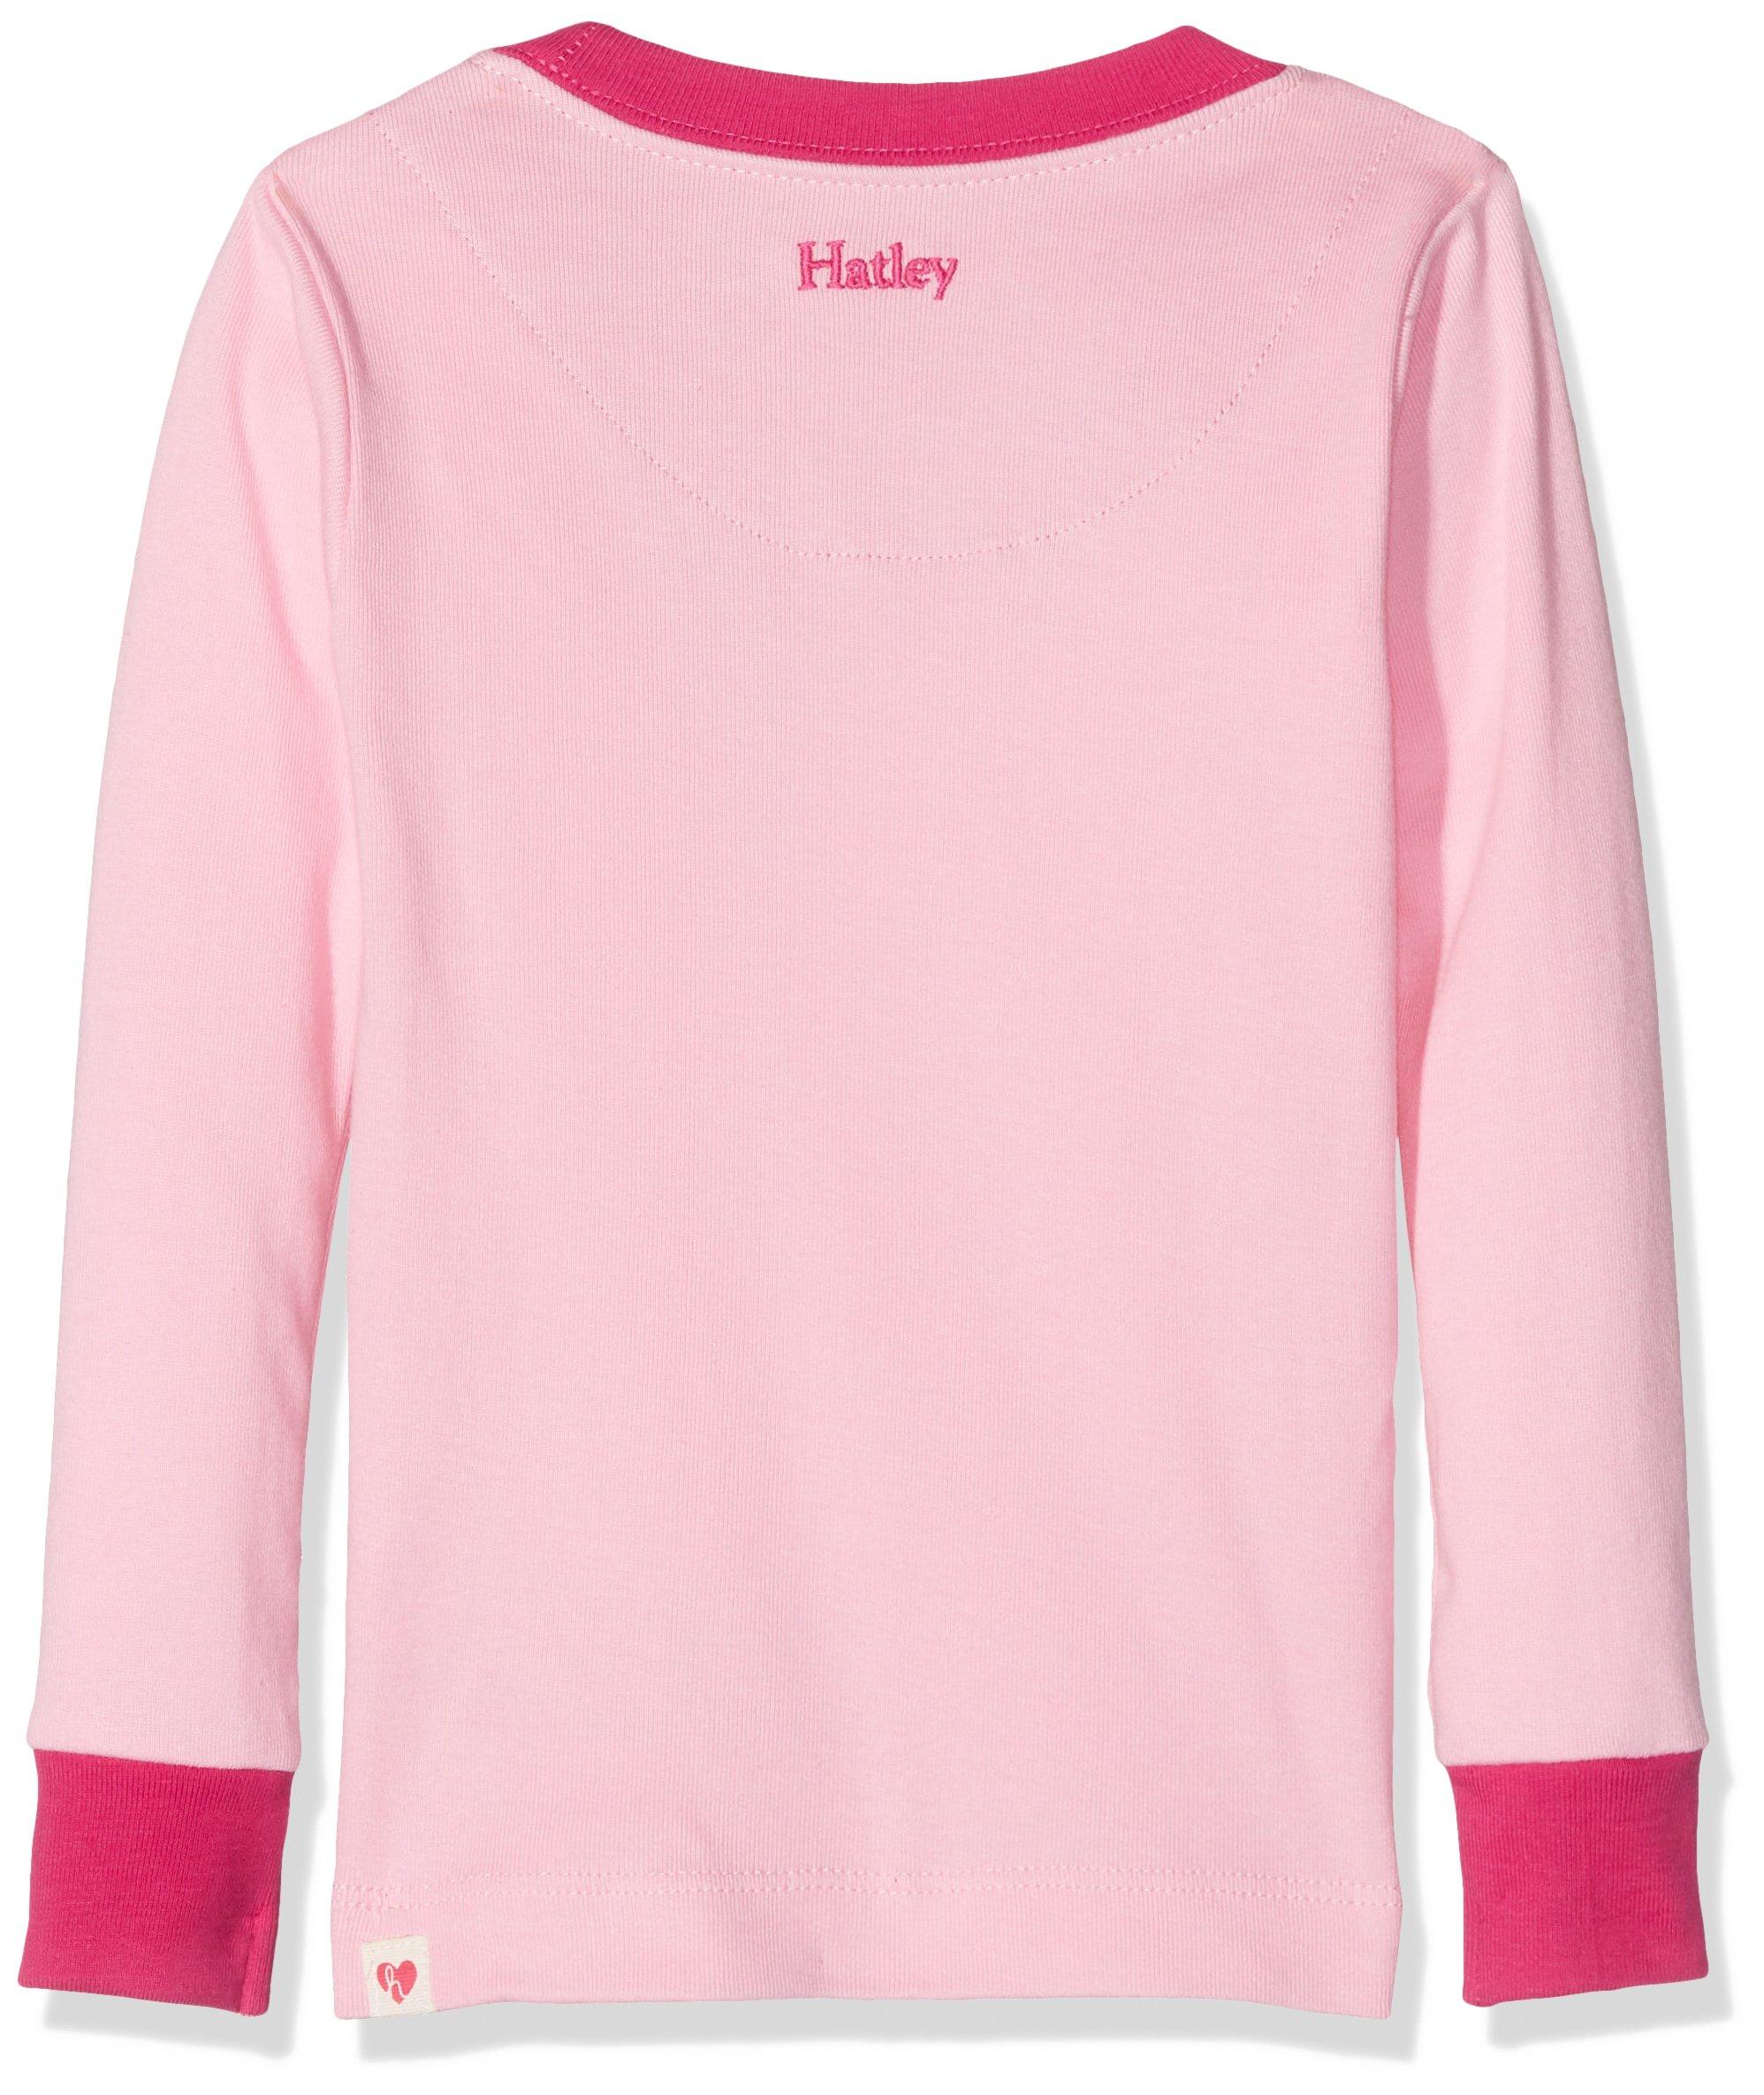 Hatley Kids Baby Girl's Princess Pups Ruff Night PJ Set (Toddler/Little Kids/Big Kids) Pink 5 by Hatley (Image #2)